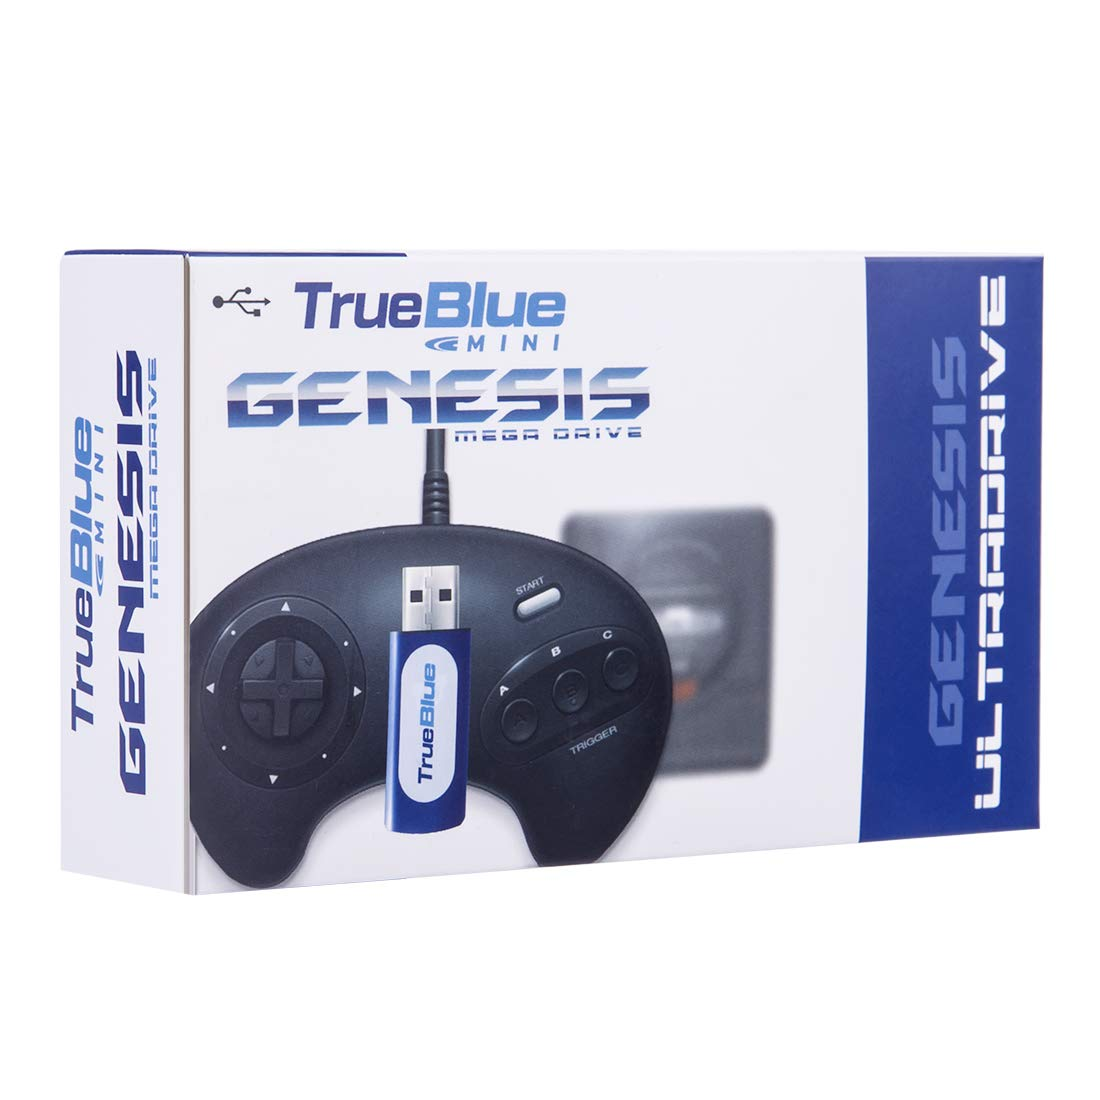 Petforu True Blue Mini Ultradrive Pack 813 Games for Sega Genesis /Mega Drive Mini